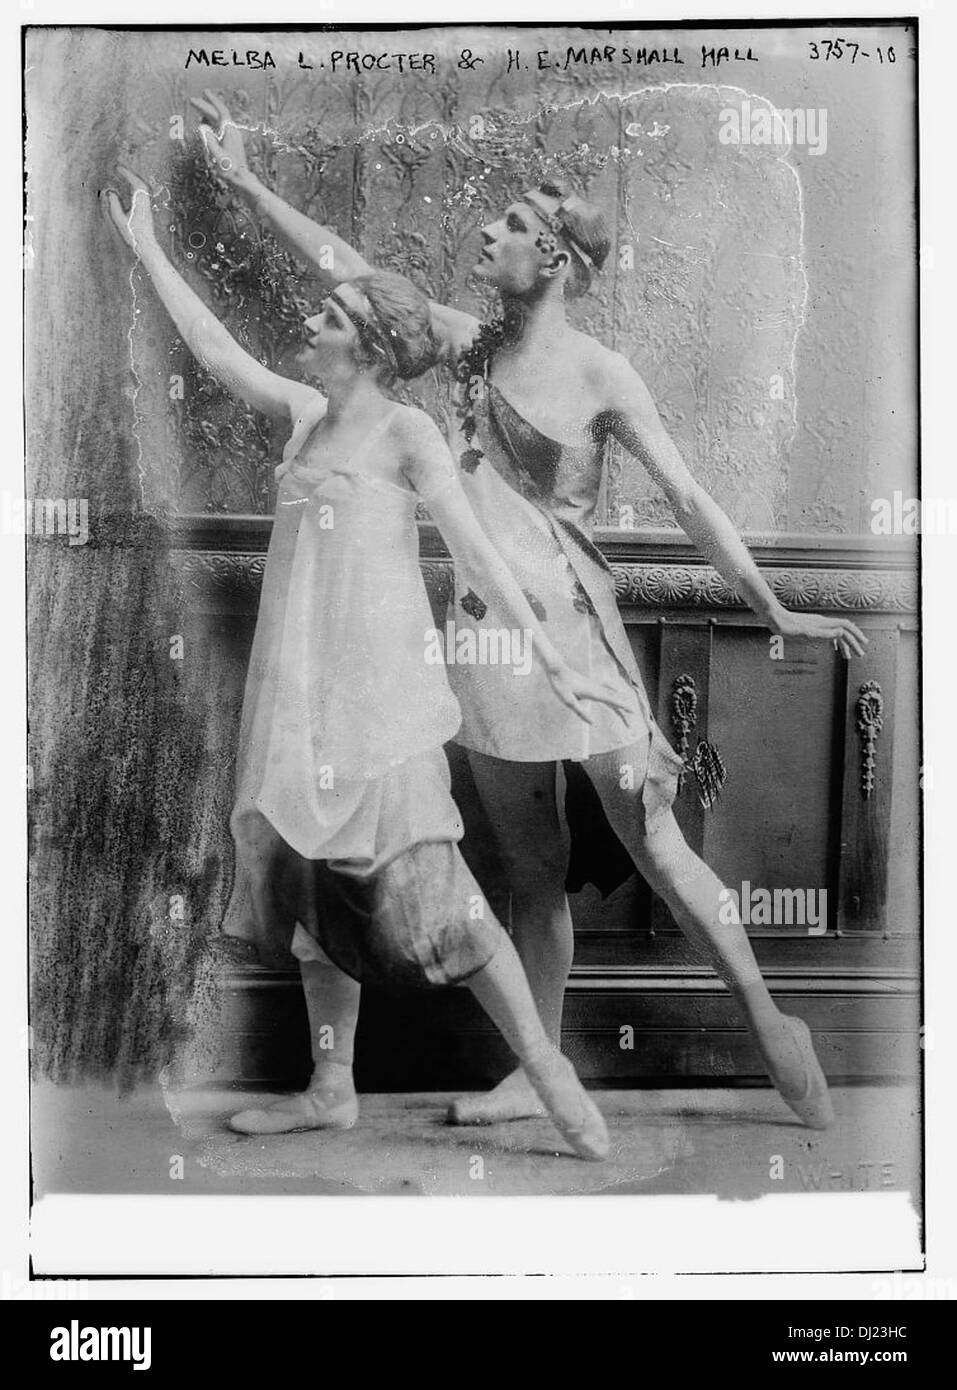 Melba L. Procter & H.E. Marshall Hall [Ballet] (LOC) - Stock Image